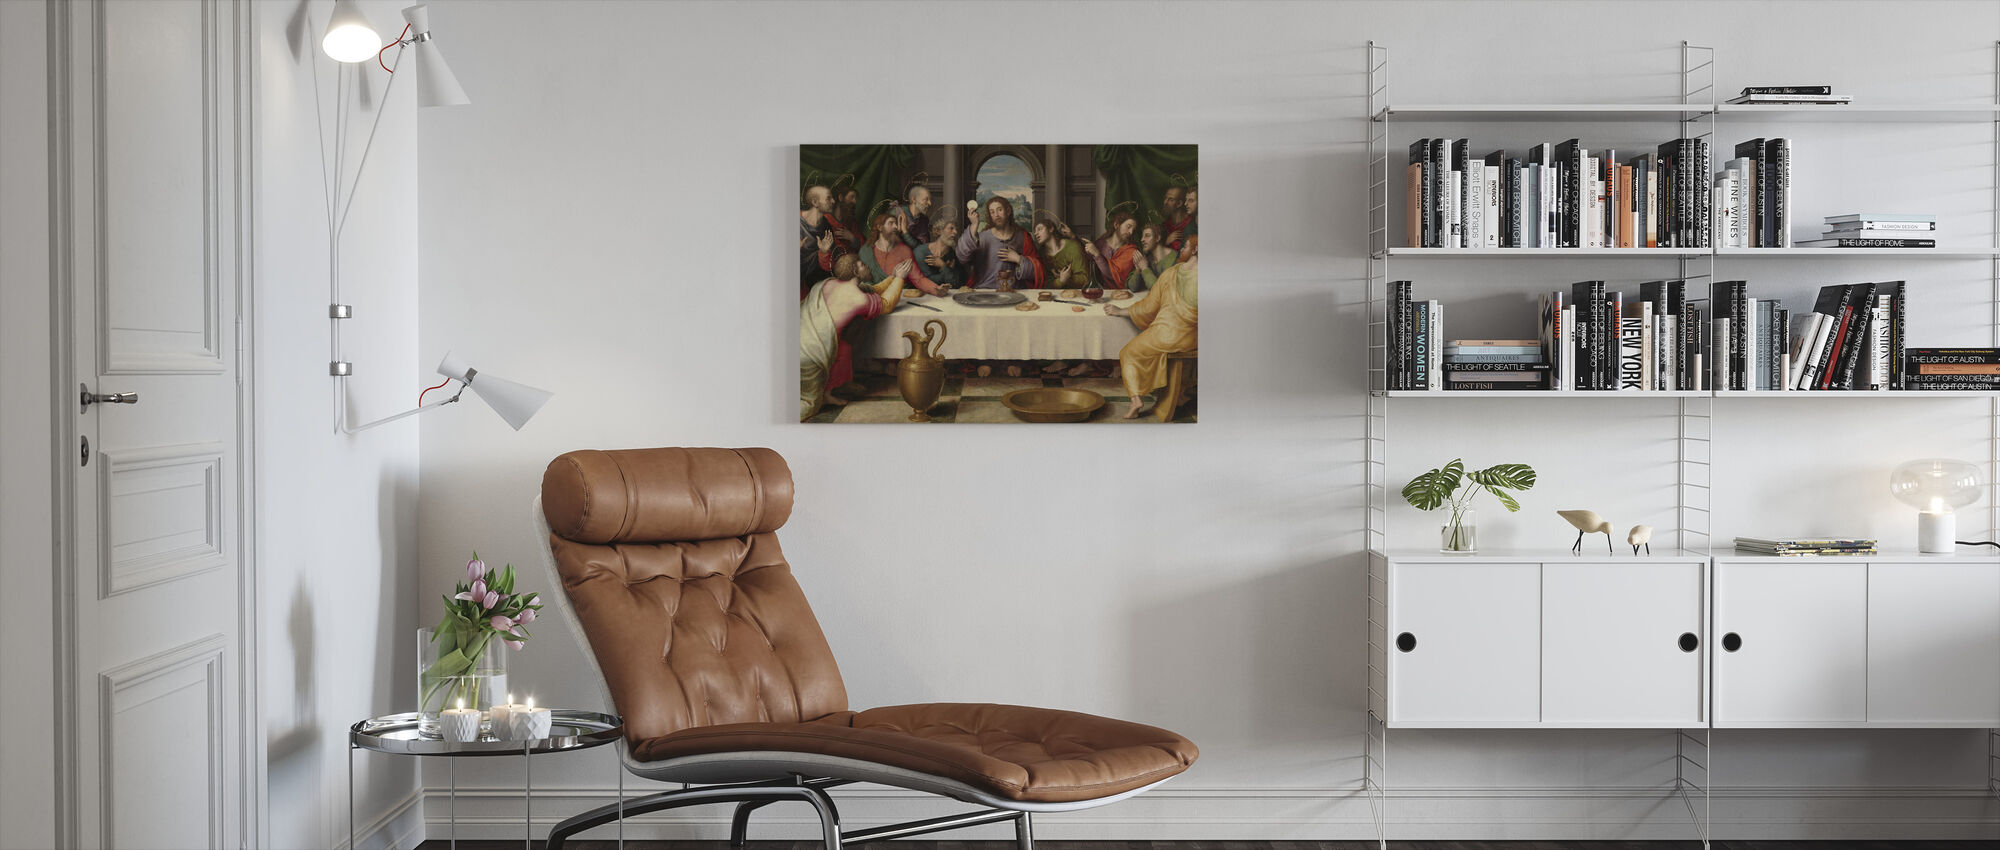 Letztes Abendmahl Juan De Juanes - Leinwandbild - Wohnzimmer